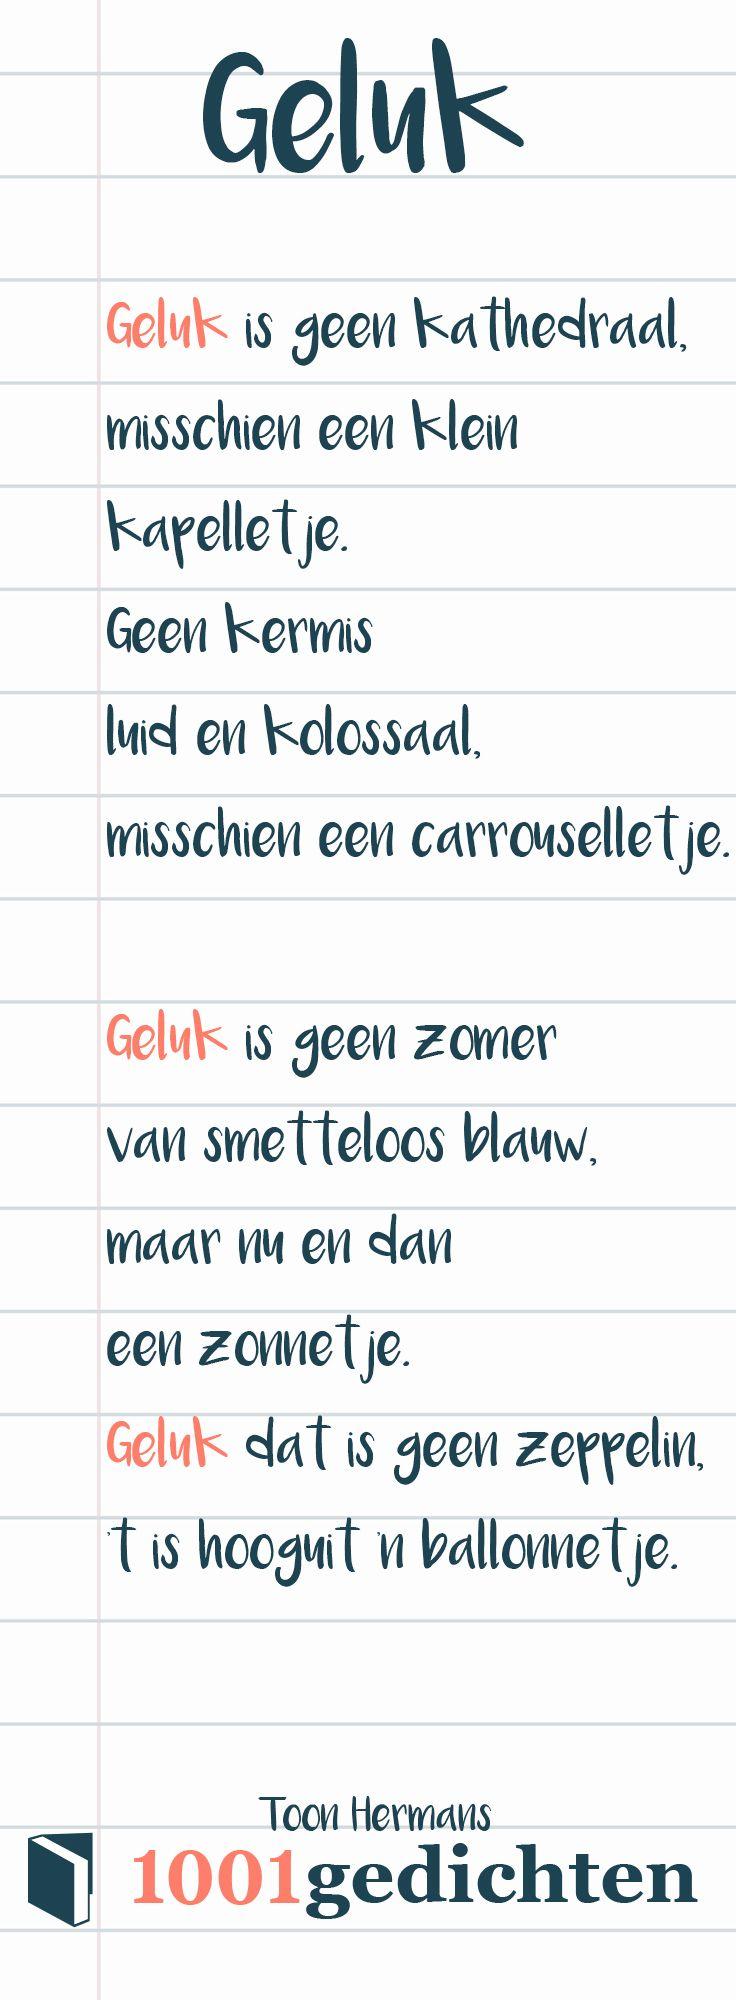 Beroemd Toon Hermans gedicht. Gedicht over geluk. Wat is jou definitie van #TN79